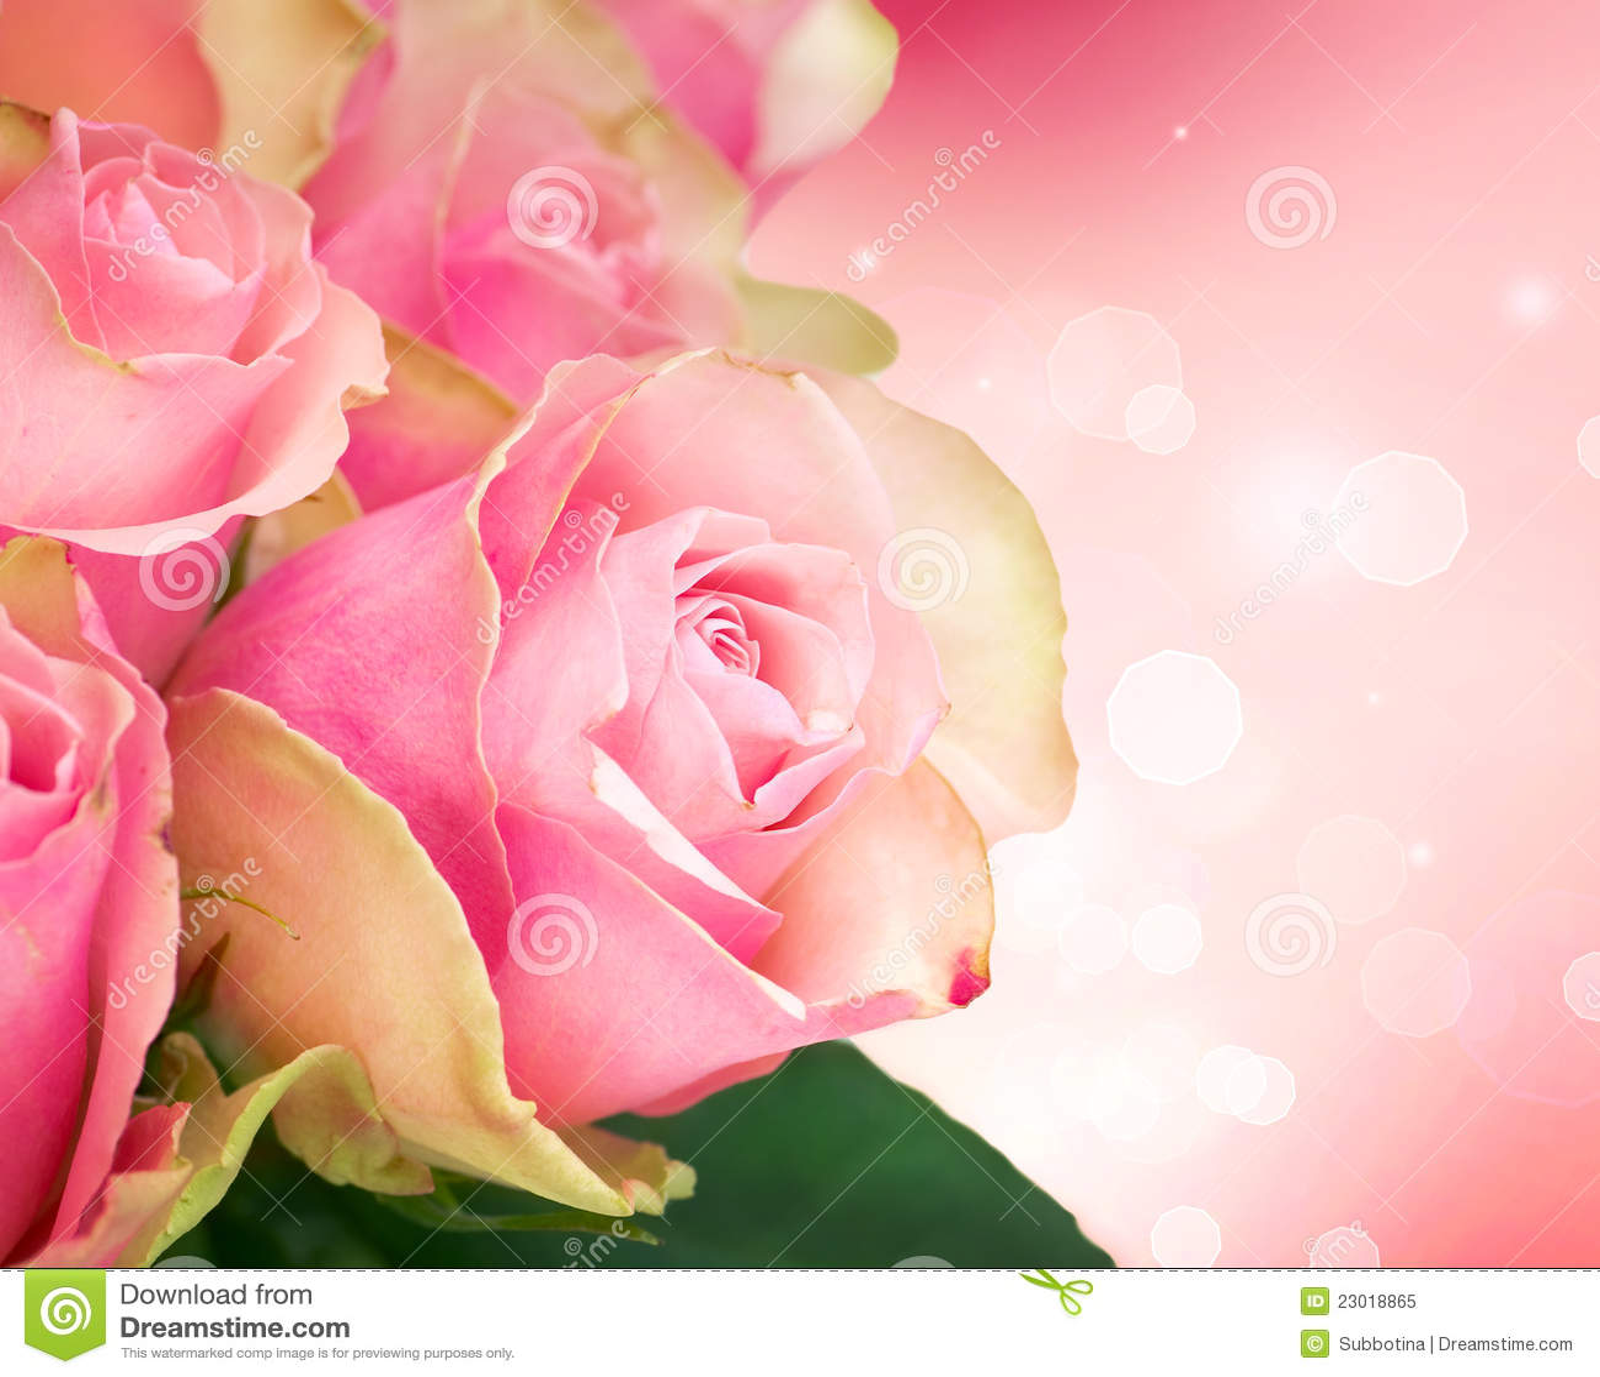 Rose Flower Art Design Royalty Free Stock Image